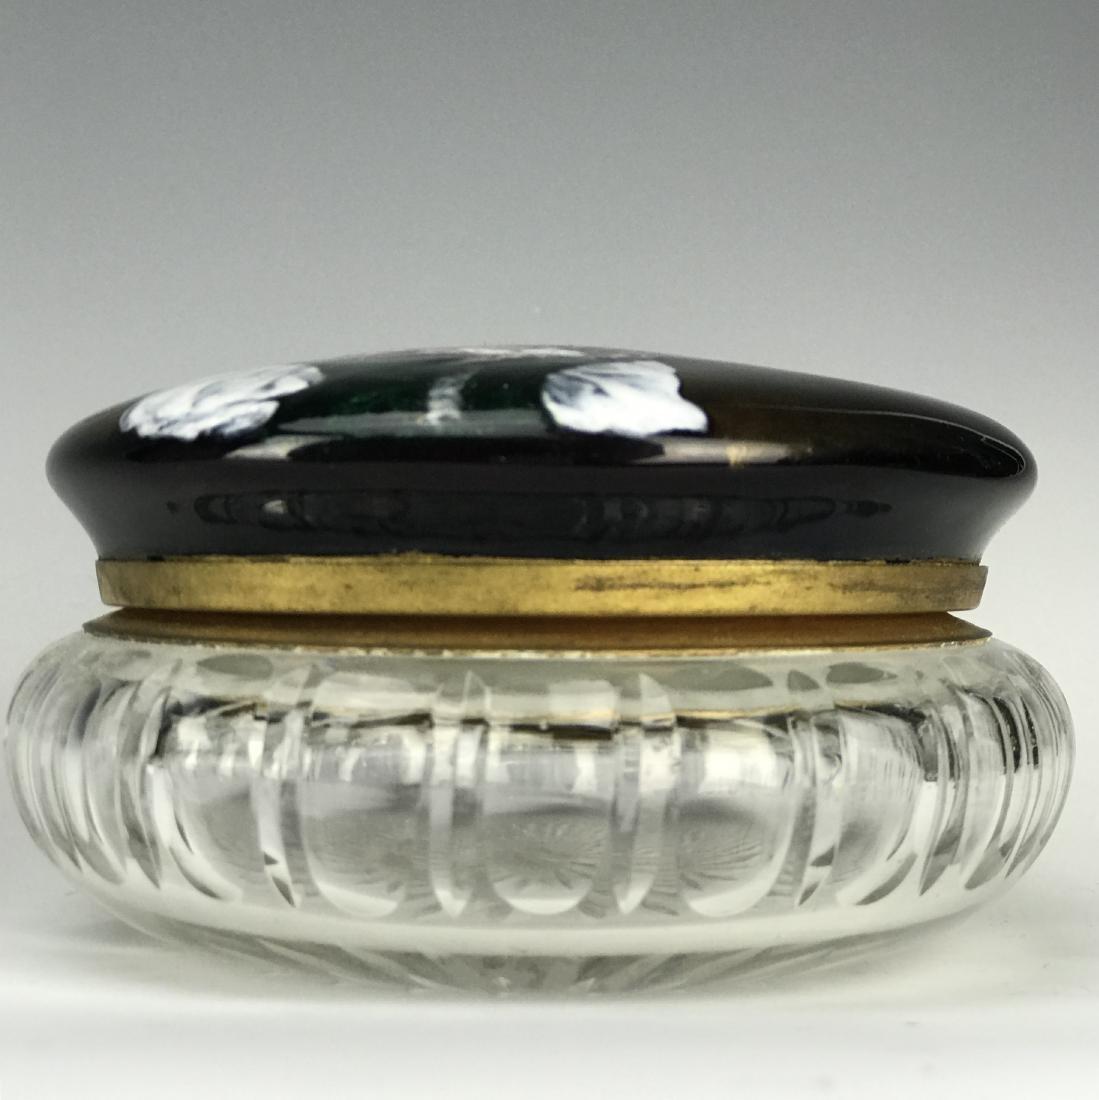 19th C. French Enamel & Crystal Jewelry Box - 5